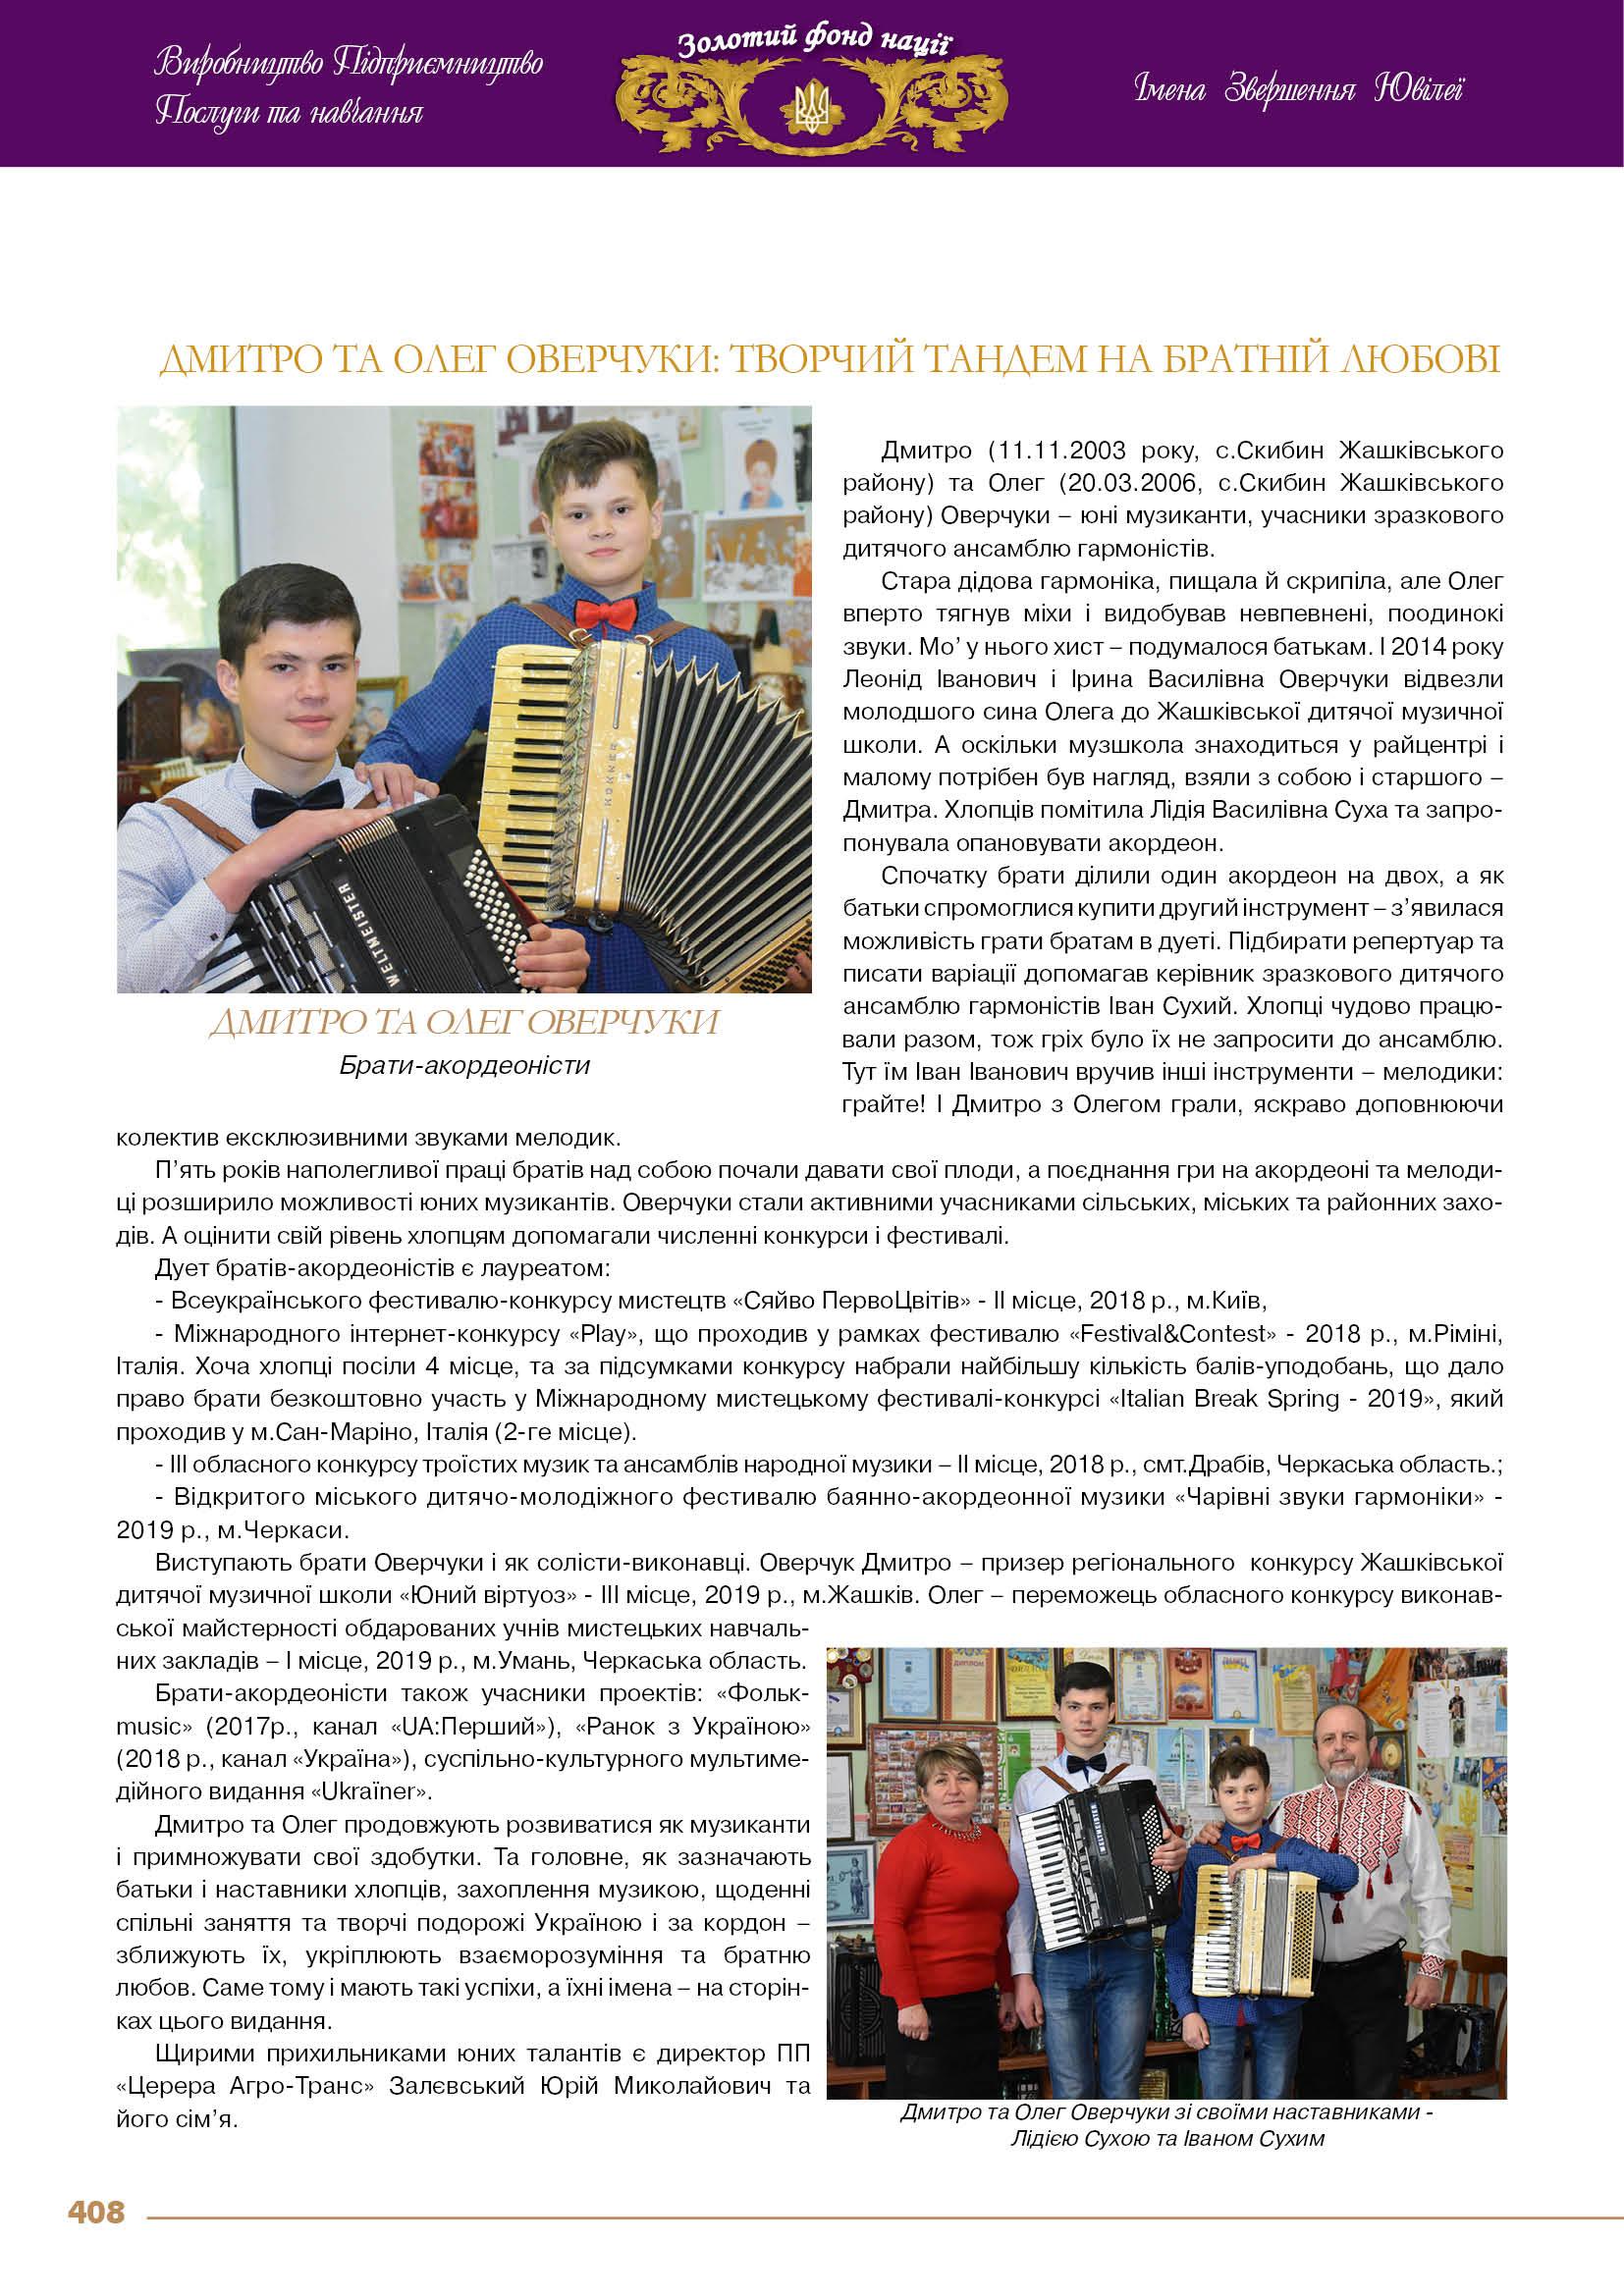 Дмитро та Олег Оверчуки